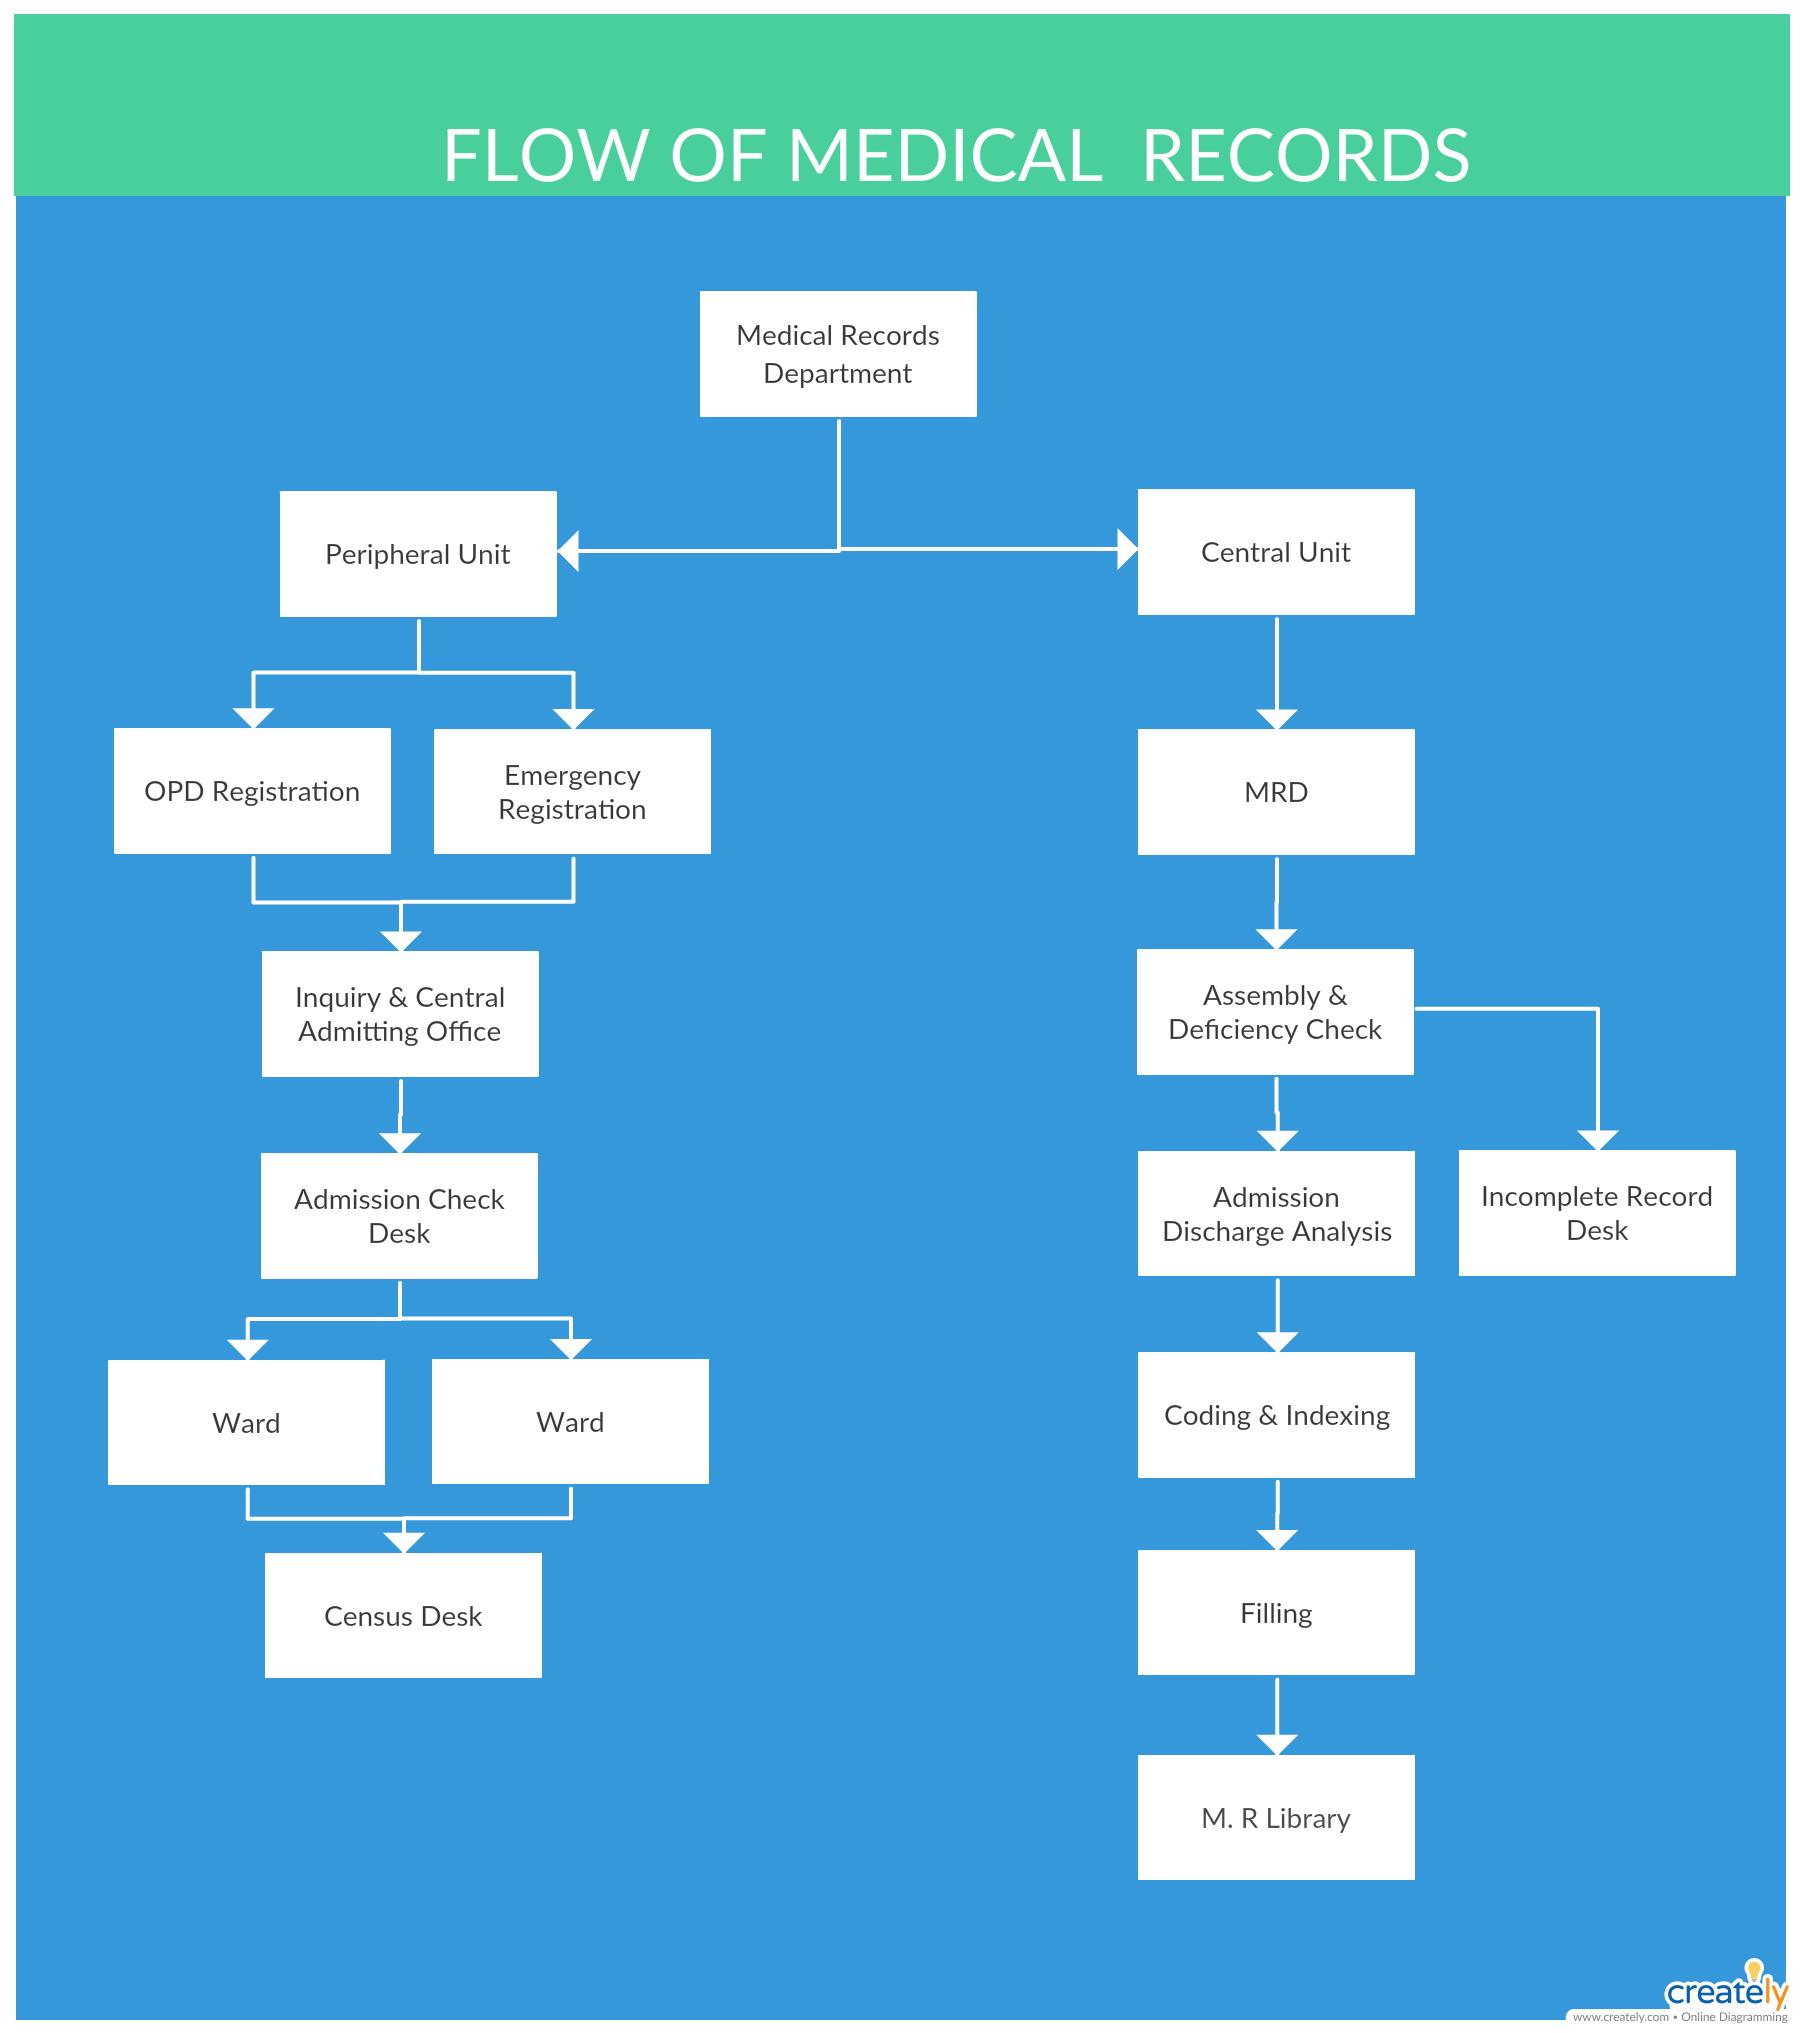 Flow Of Medical Records Medical Flowcharts Medical Records Flow Chart Medical